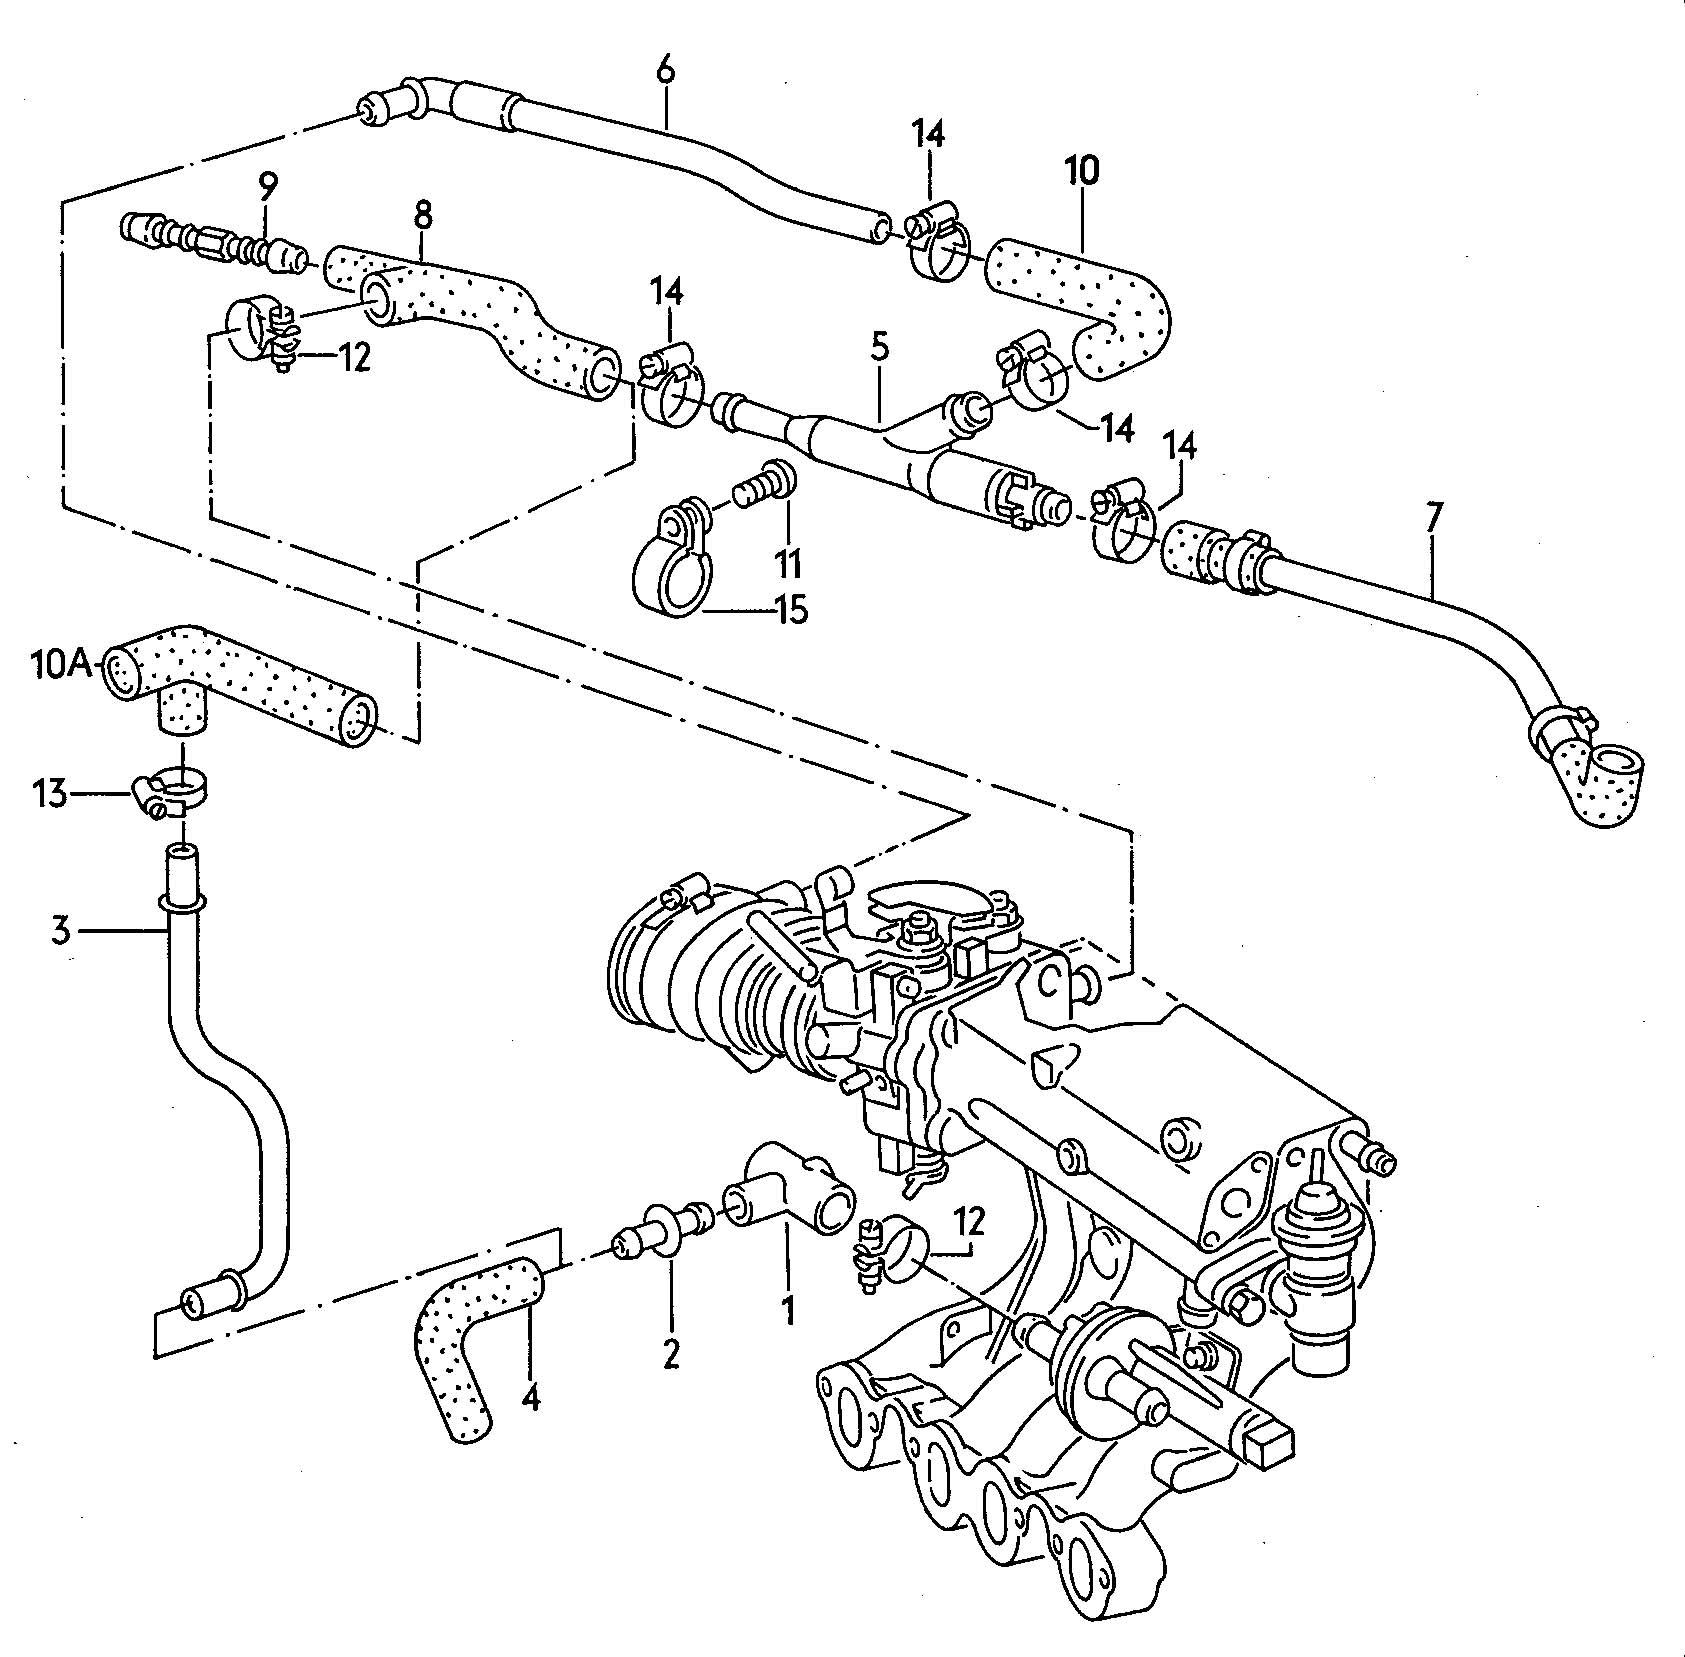 1964 vw beetle wiring diagram free